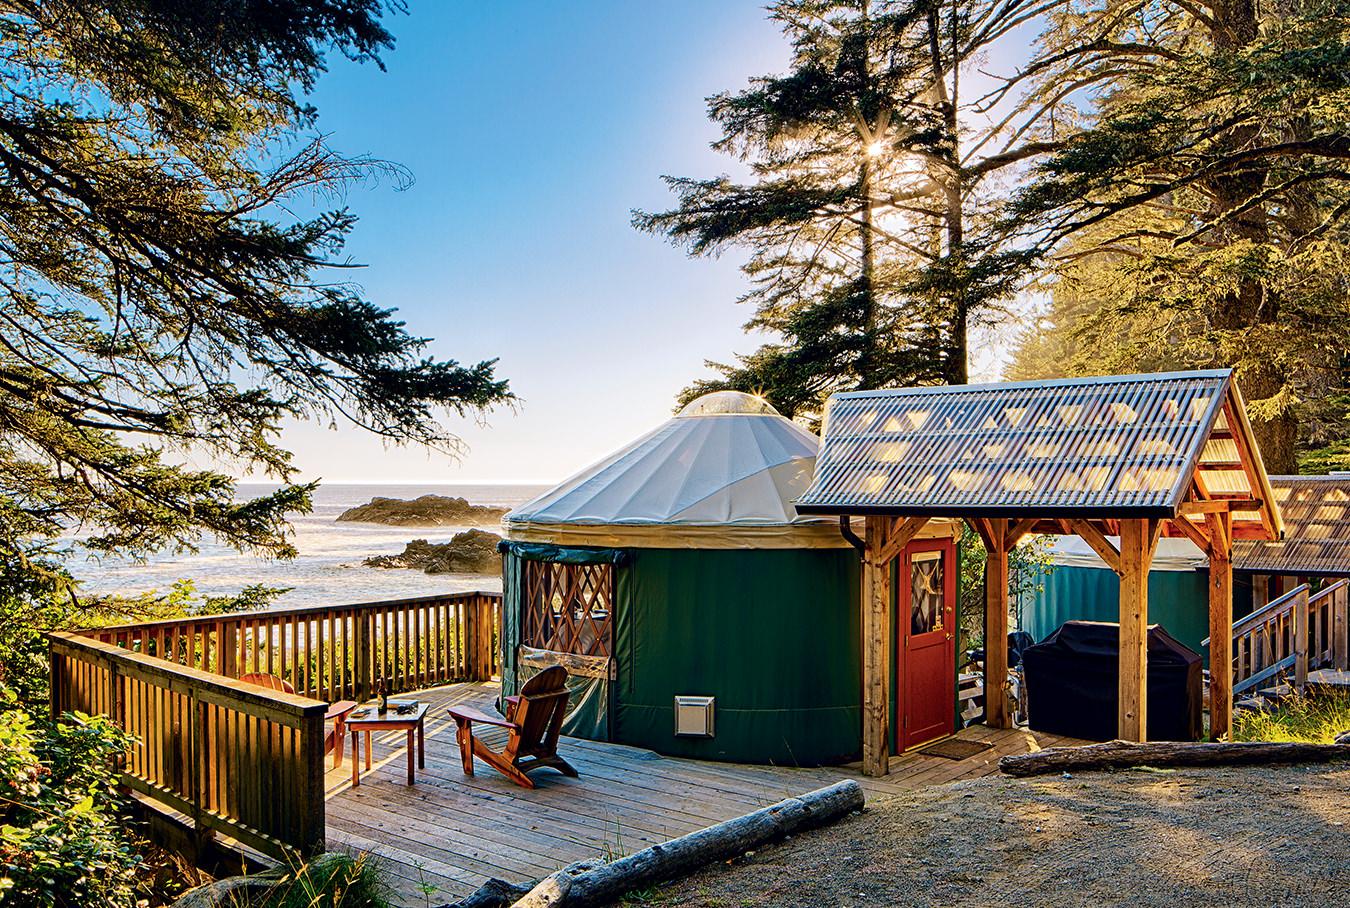 MONTECRISTO Magazine: Wya Point Resort